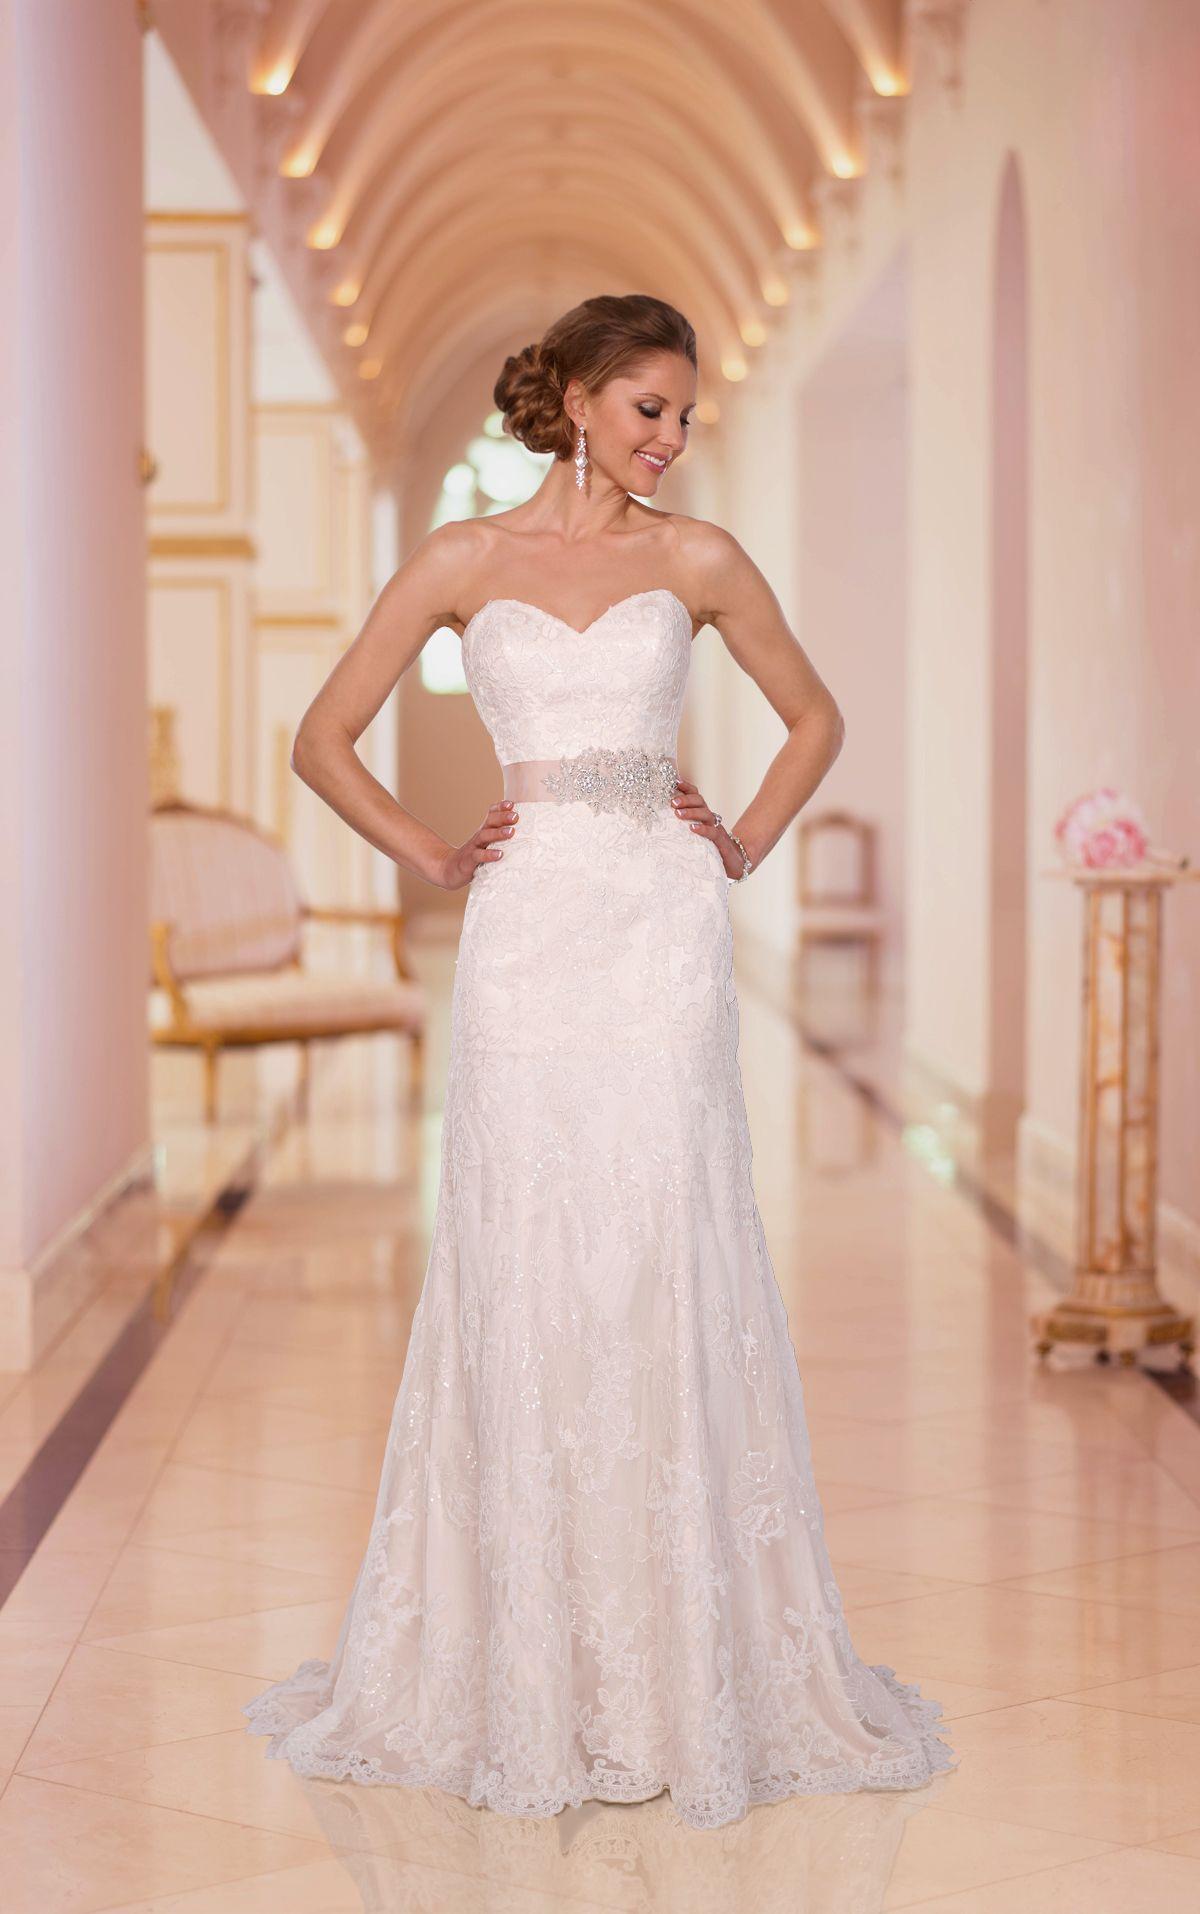 Sexy and extravagant stella york wedding dresses stella york